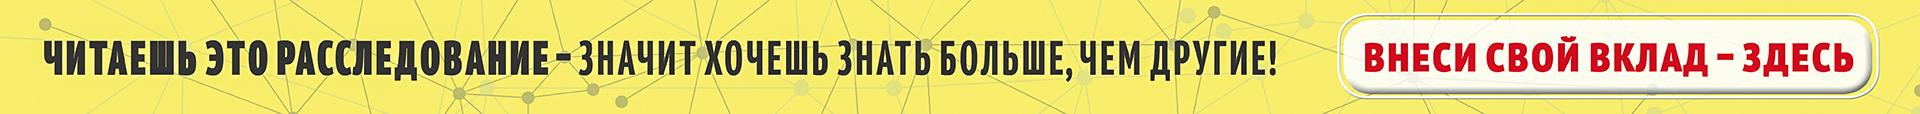 rise-md-doneaza-yellow-ru